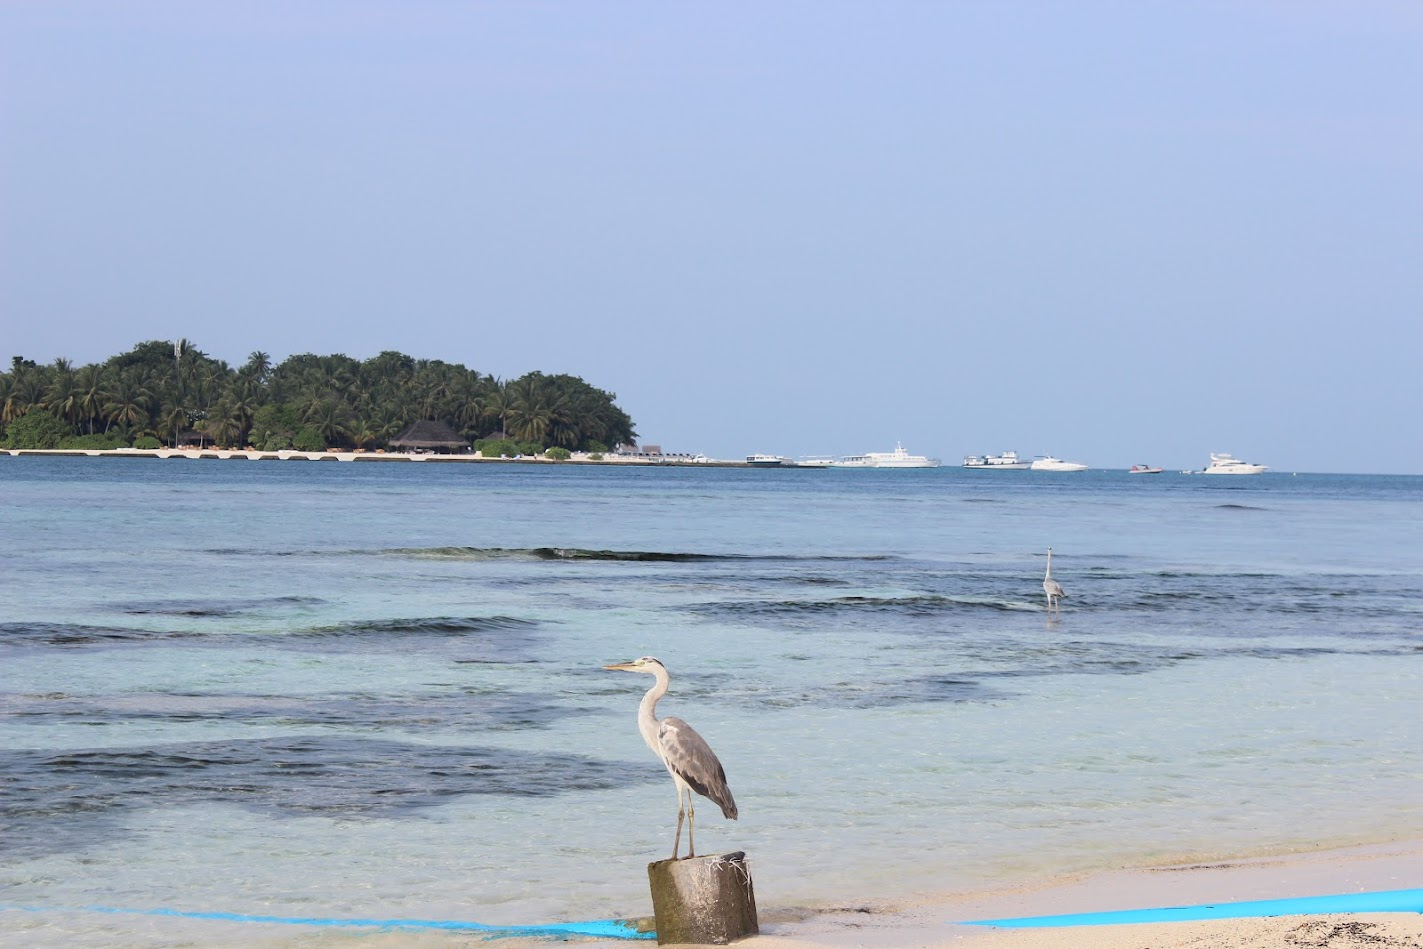 Рашдо туристический пляж бикини